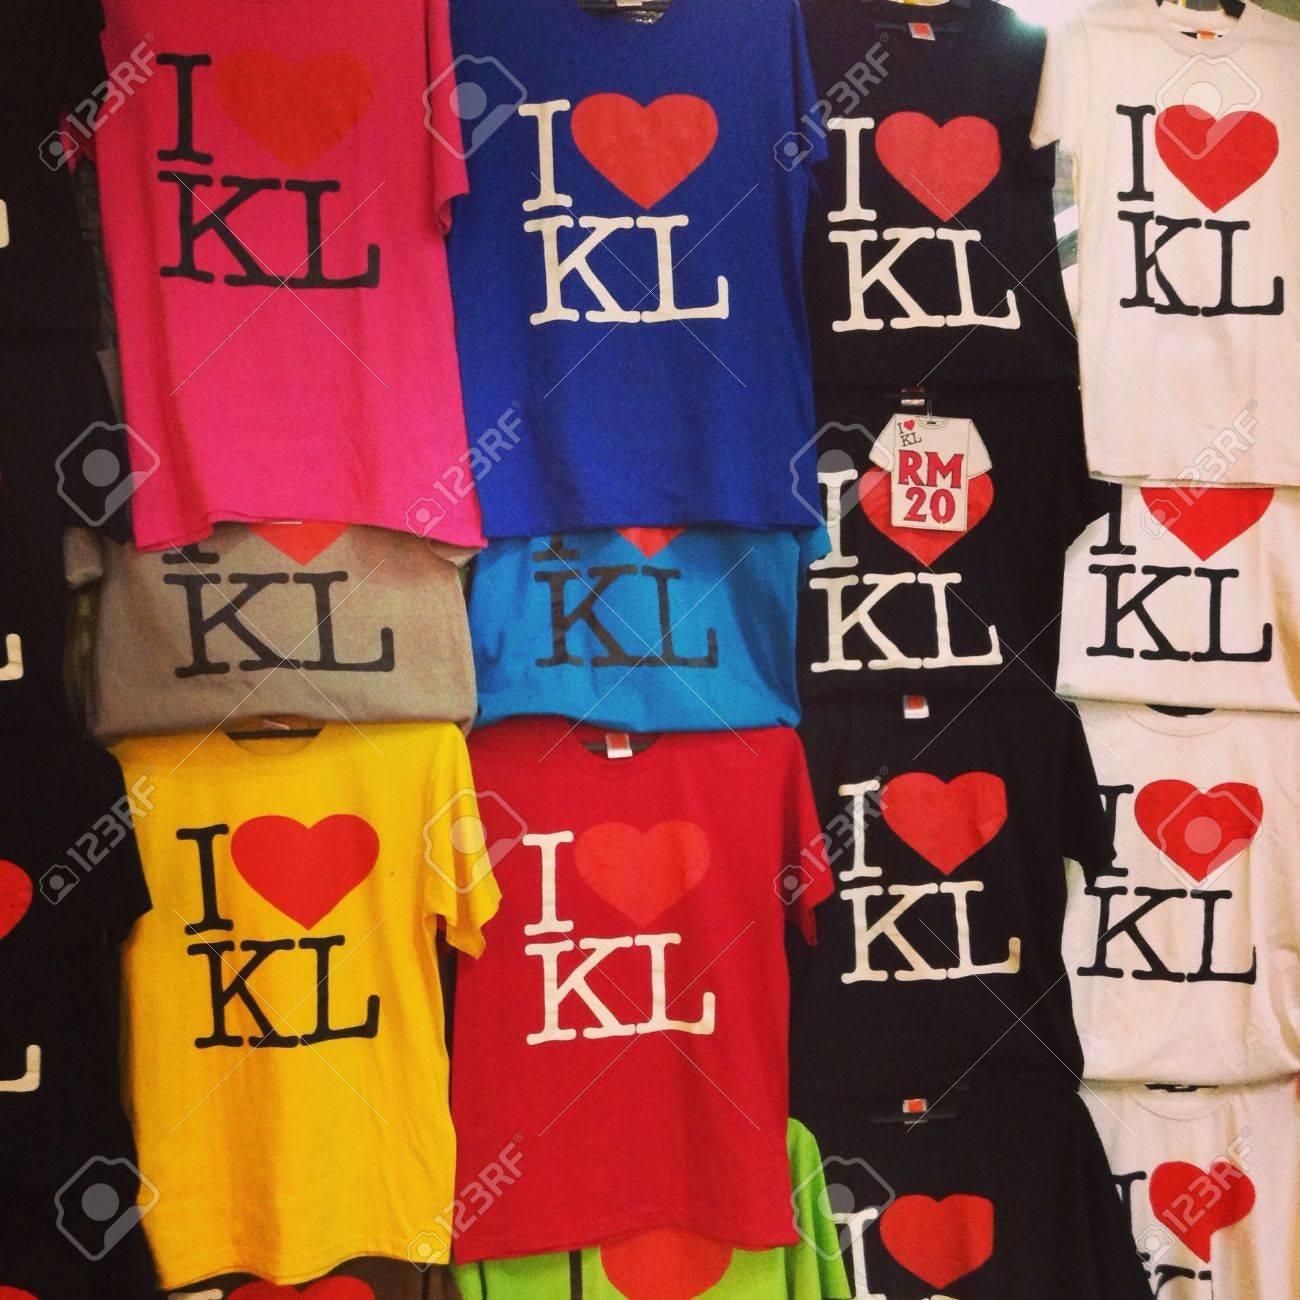 T shirt design kuala lumpur - Souvenirs T Shirts With Different Colours From Kuala Lumpur Malaysia Stock Photo 25214118